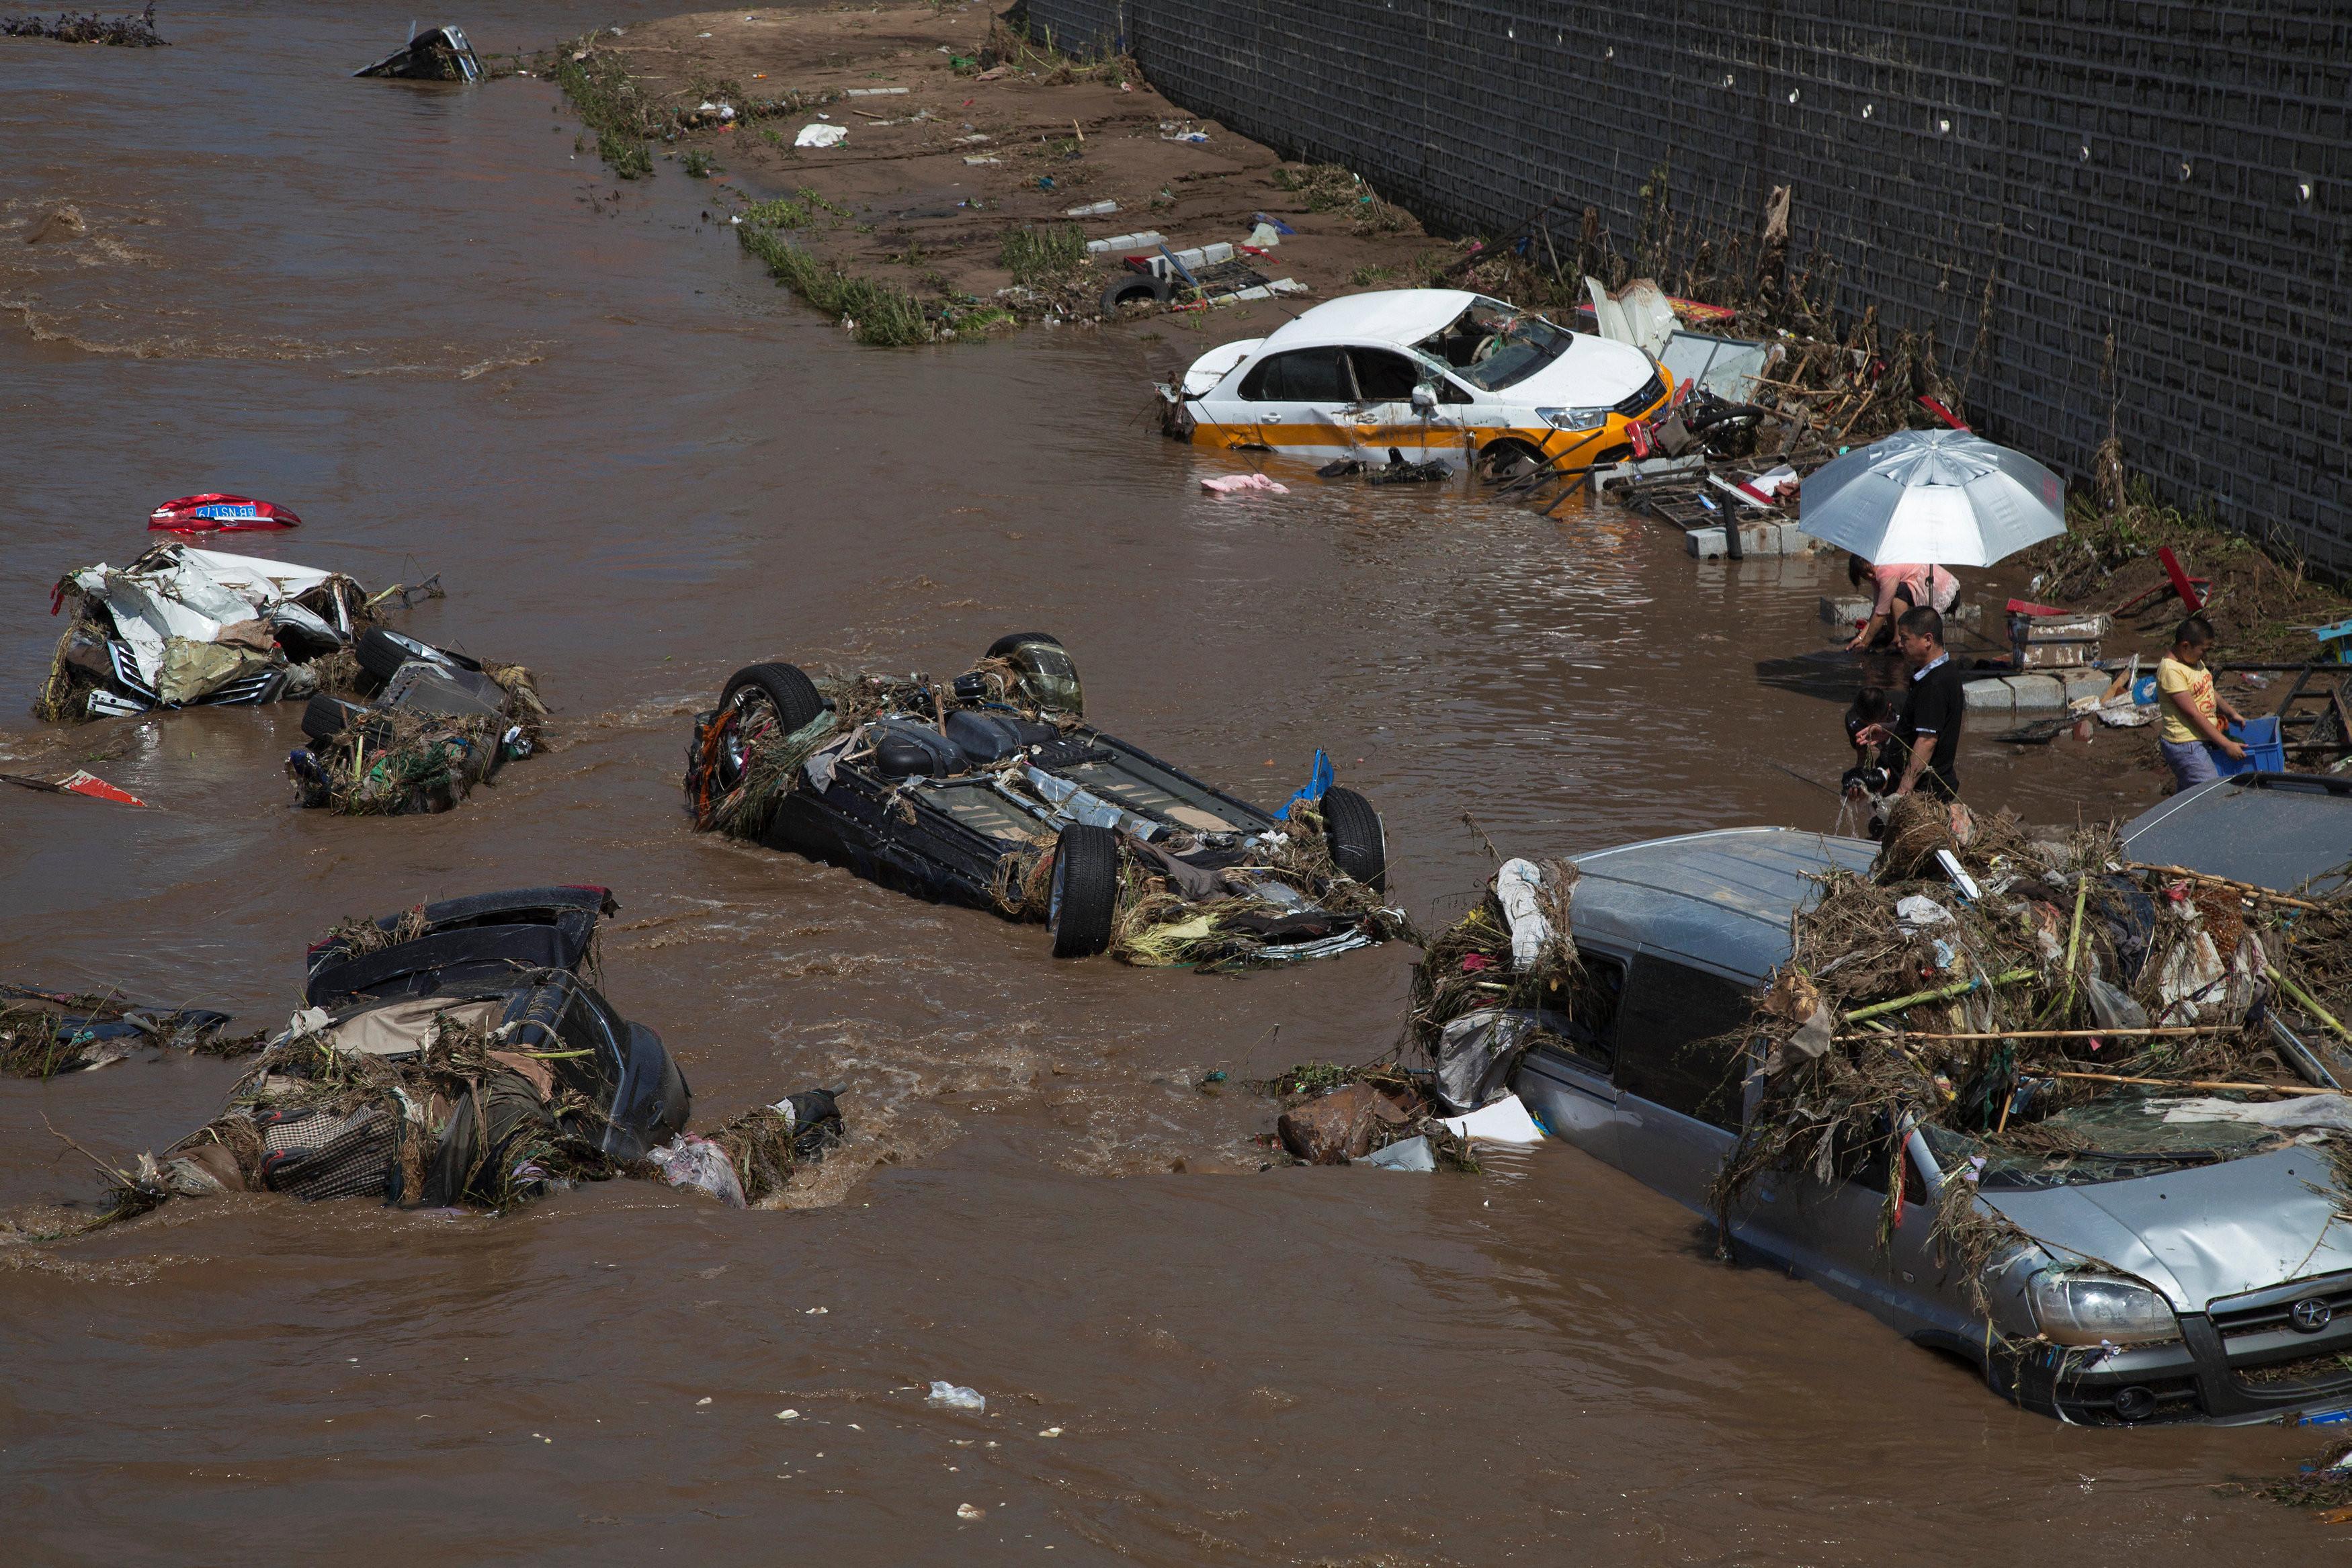 <p>Последствия наводнения в провинции Цзилинь. Фото: &copy;&nbsp;<span>REUTERS</span></p>